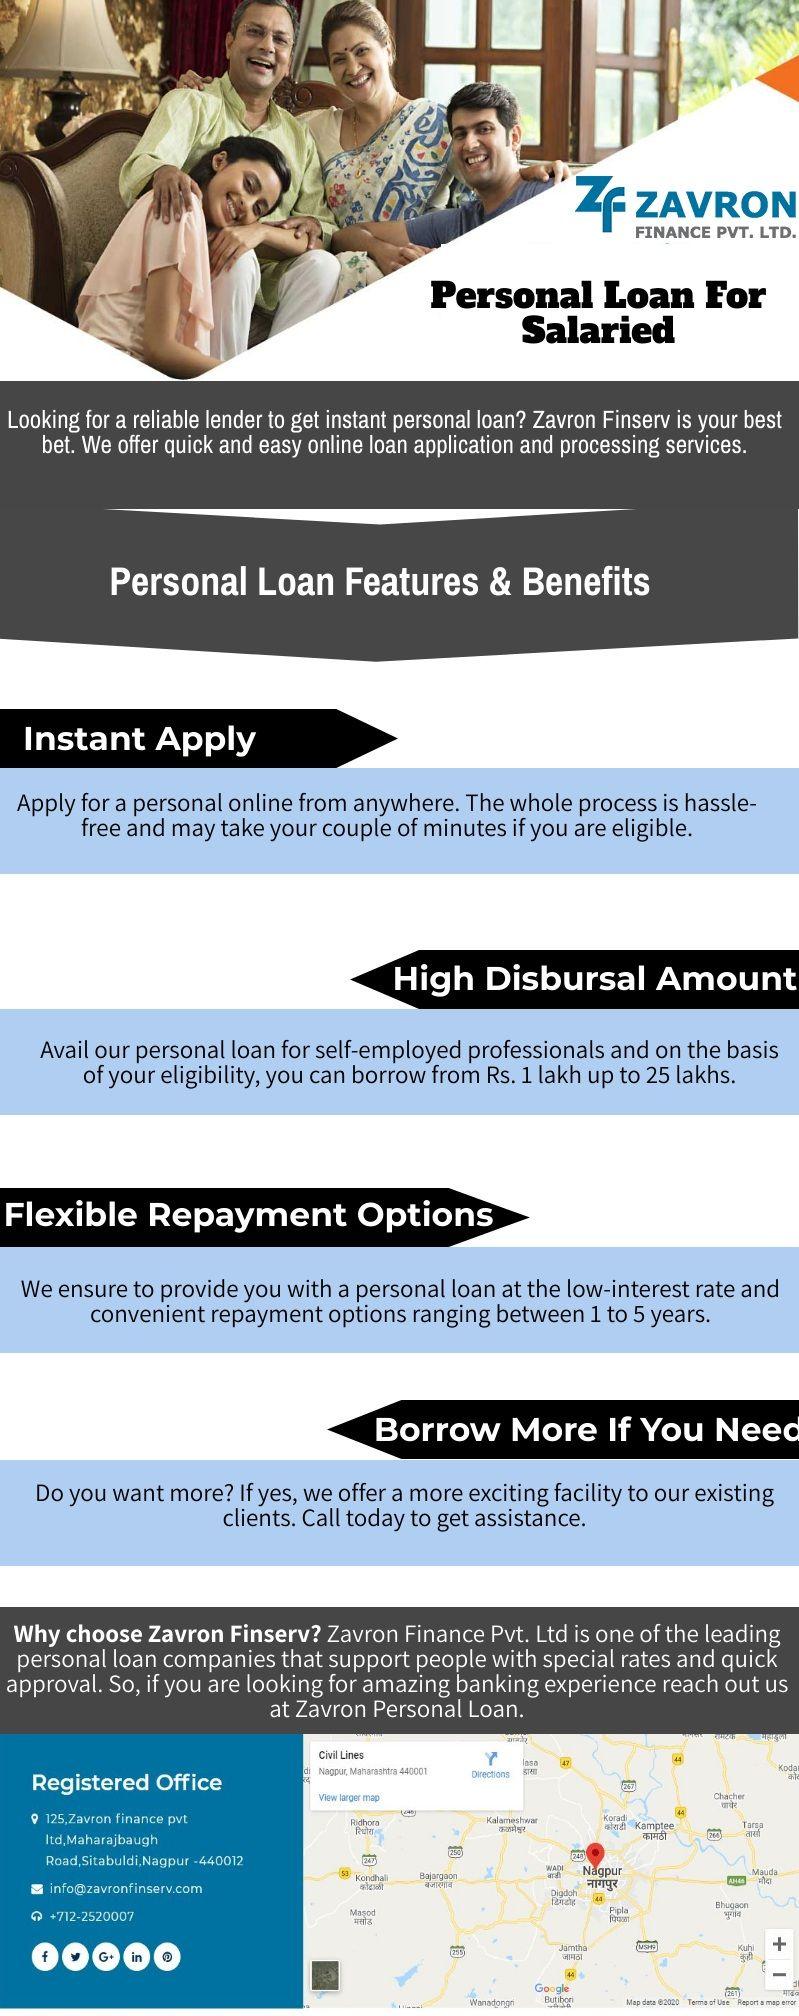 Personal Loan For Salaried In 2020 Personal Loans Instant Loans Personal Loans Online